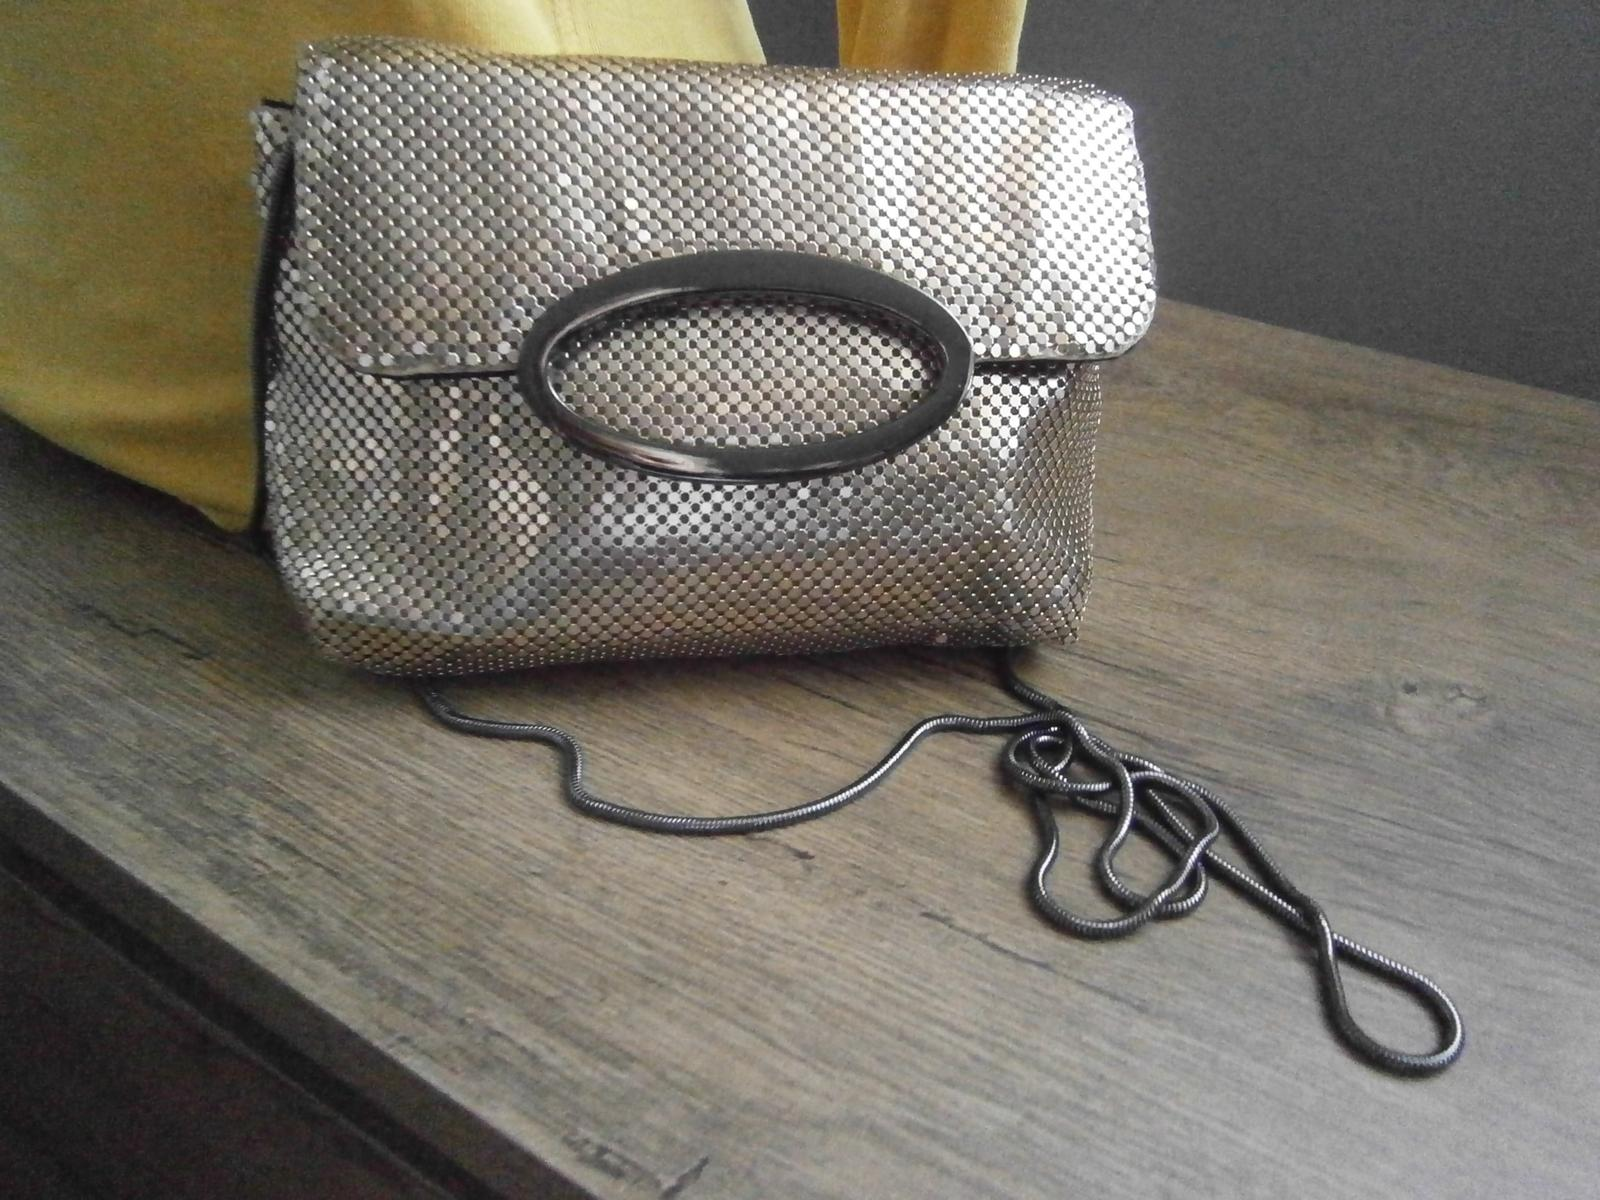 Dámska spoloč. kabelka- Reserved - Obrázok č. 2